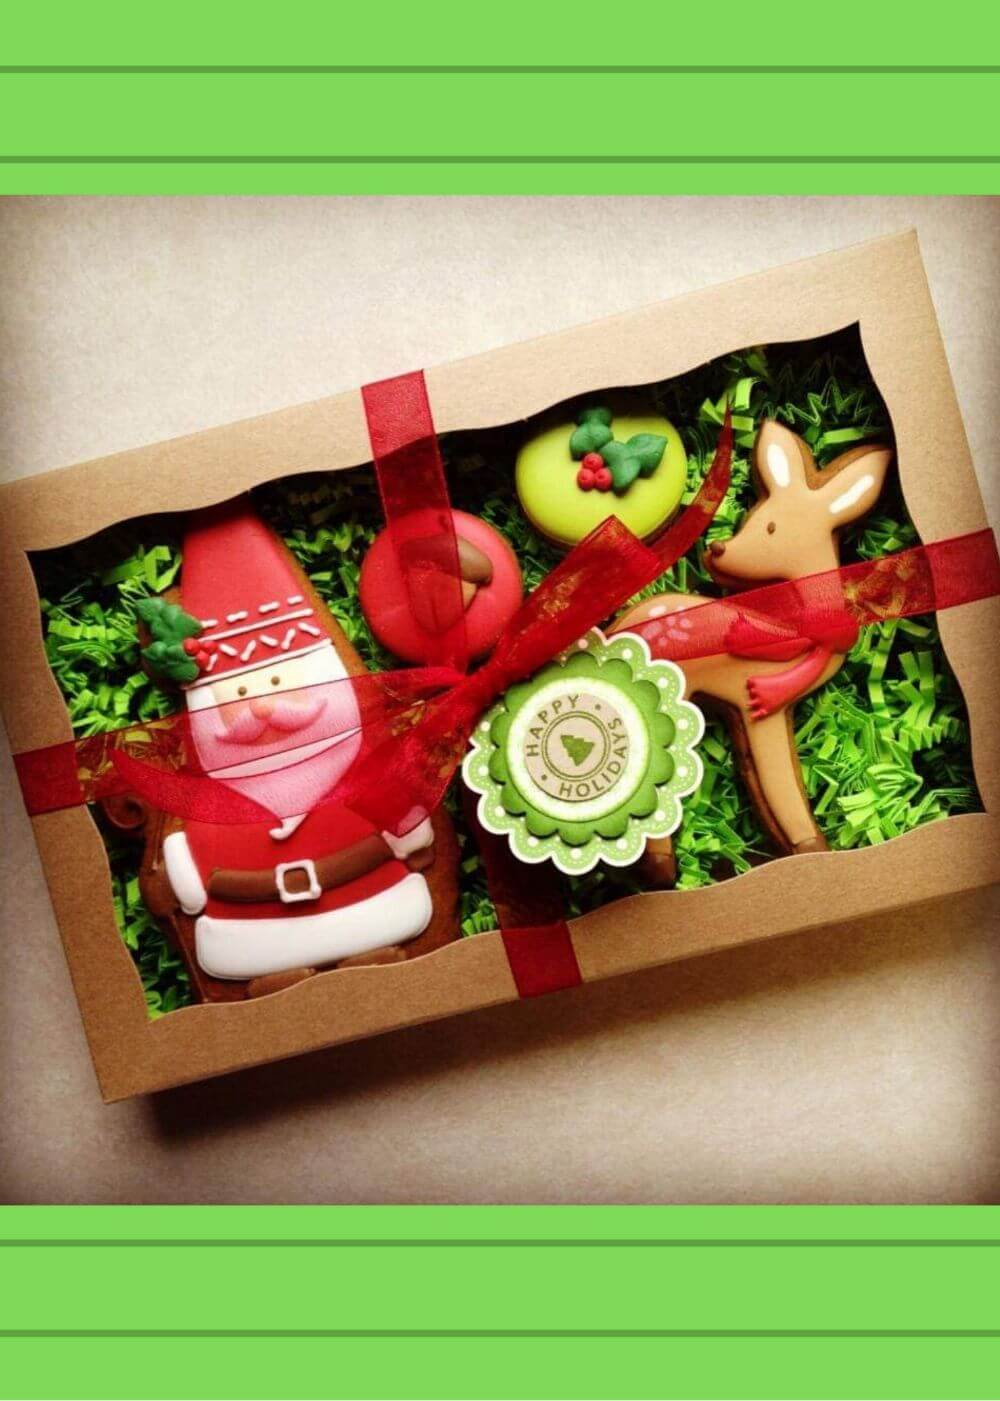 Name-Box of Holiday Wishes_Tag-Celebrations Vignettes_Season-Winter Christmas